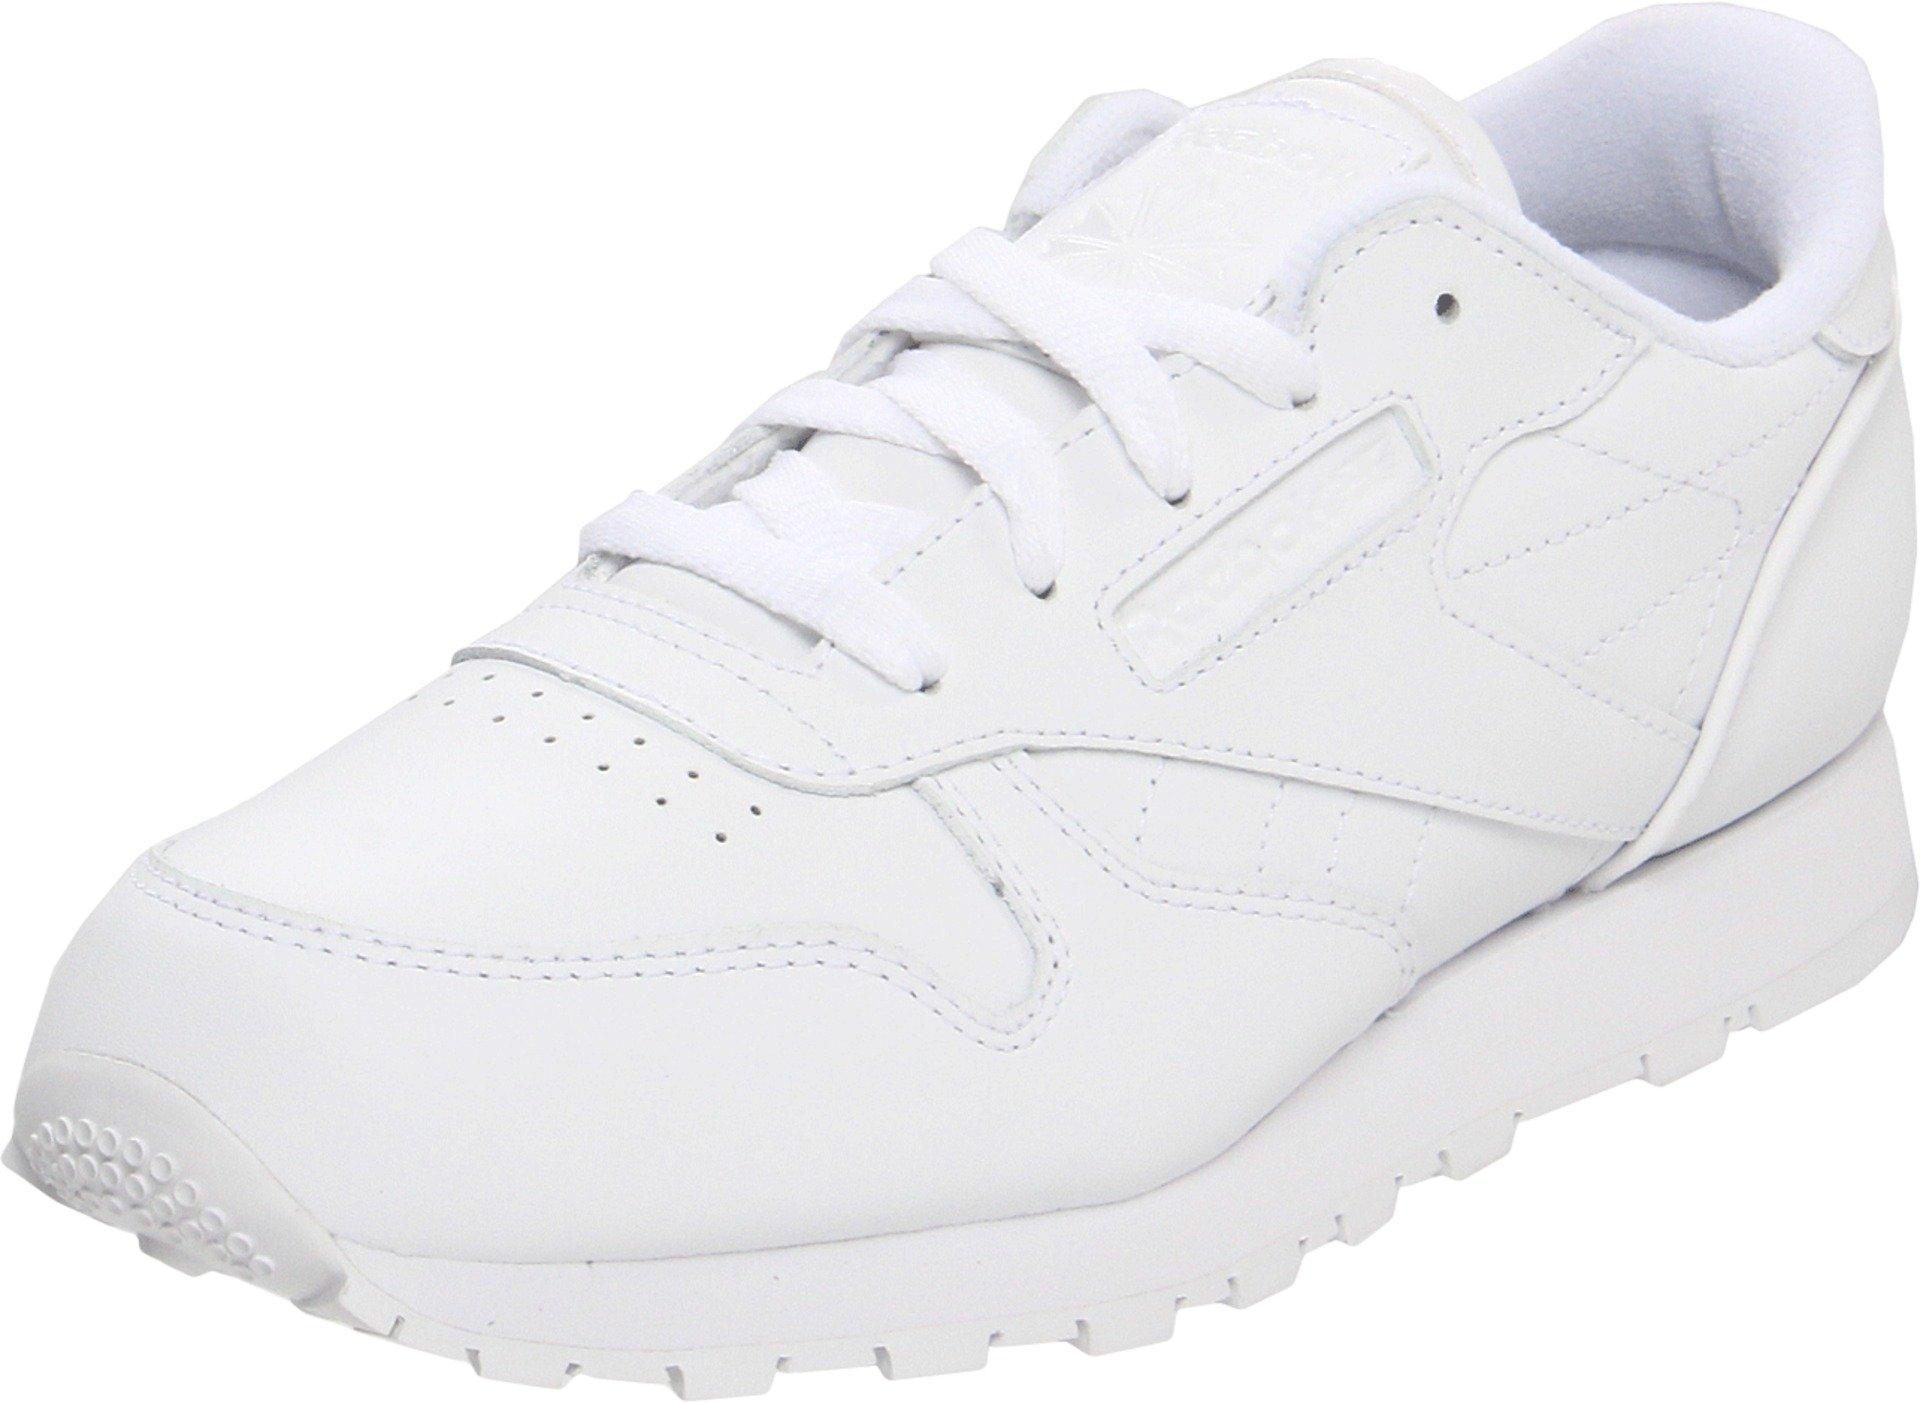 Reebok Classic Leather Shoe,White/White/White,6 M US Big Kid